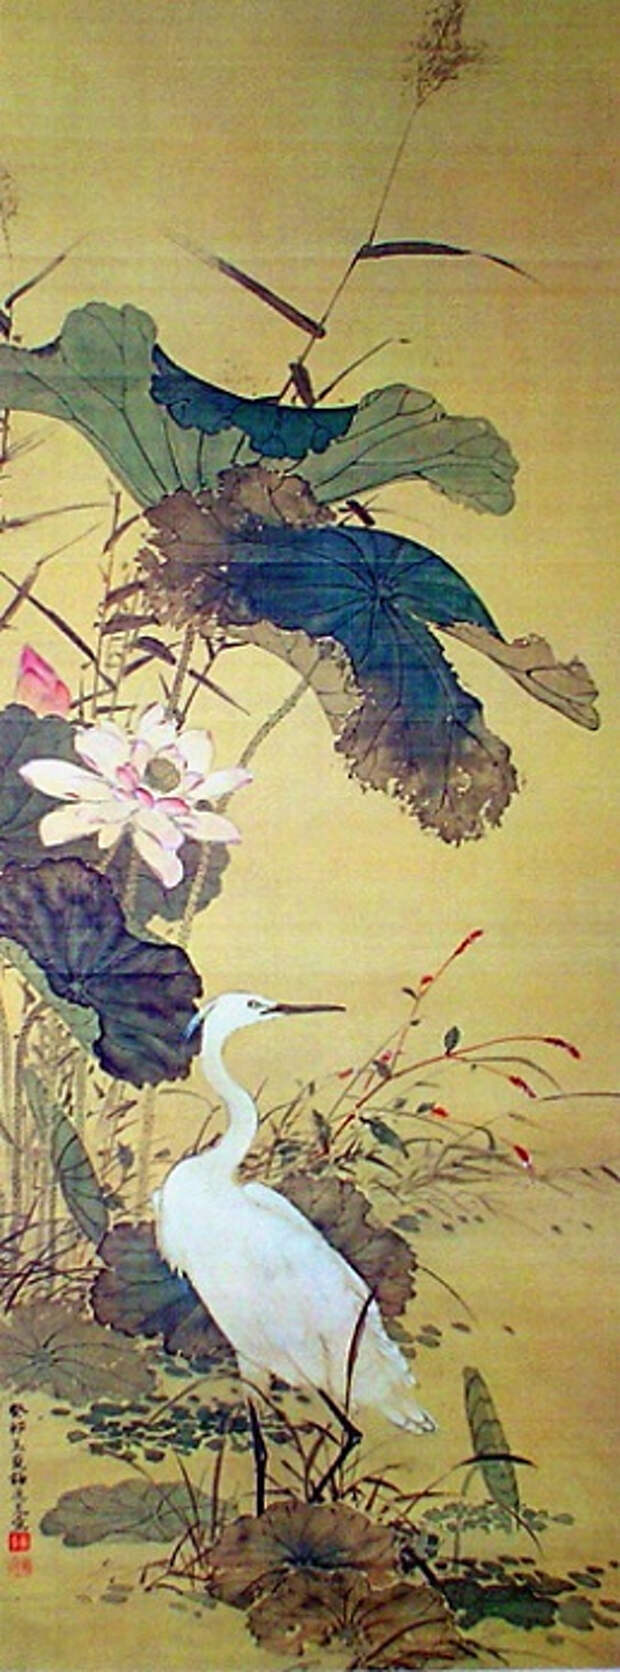 Heron And Lotus (258x696, 262Kb)